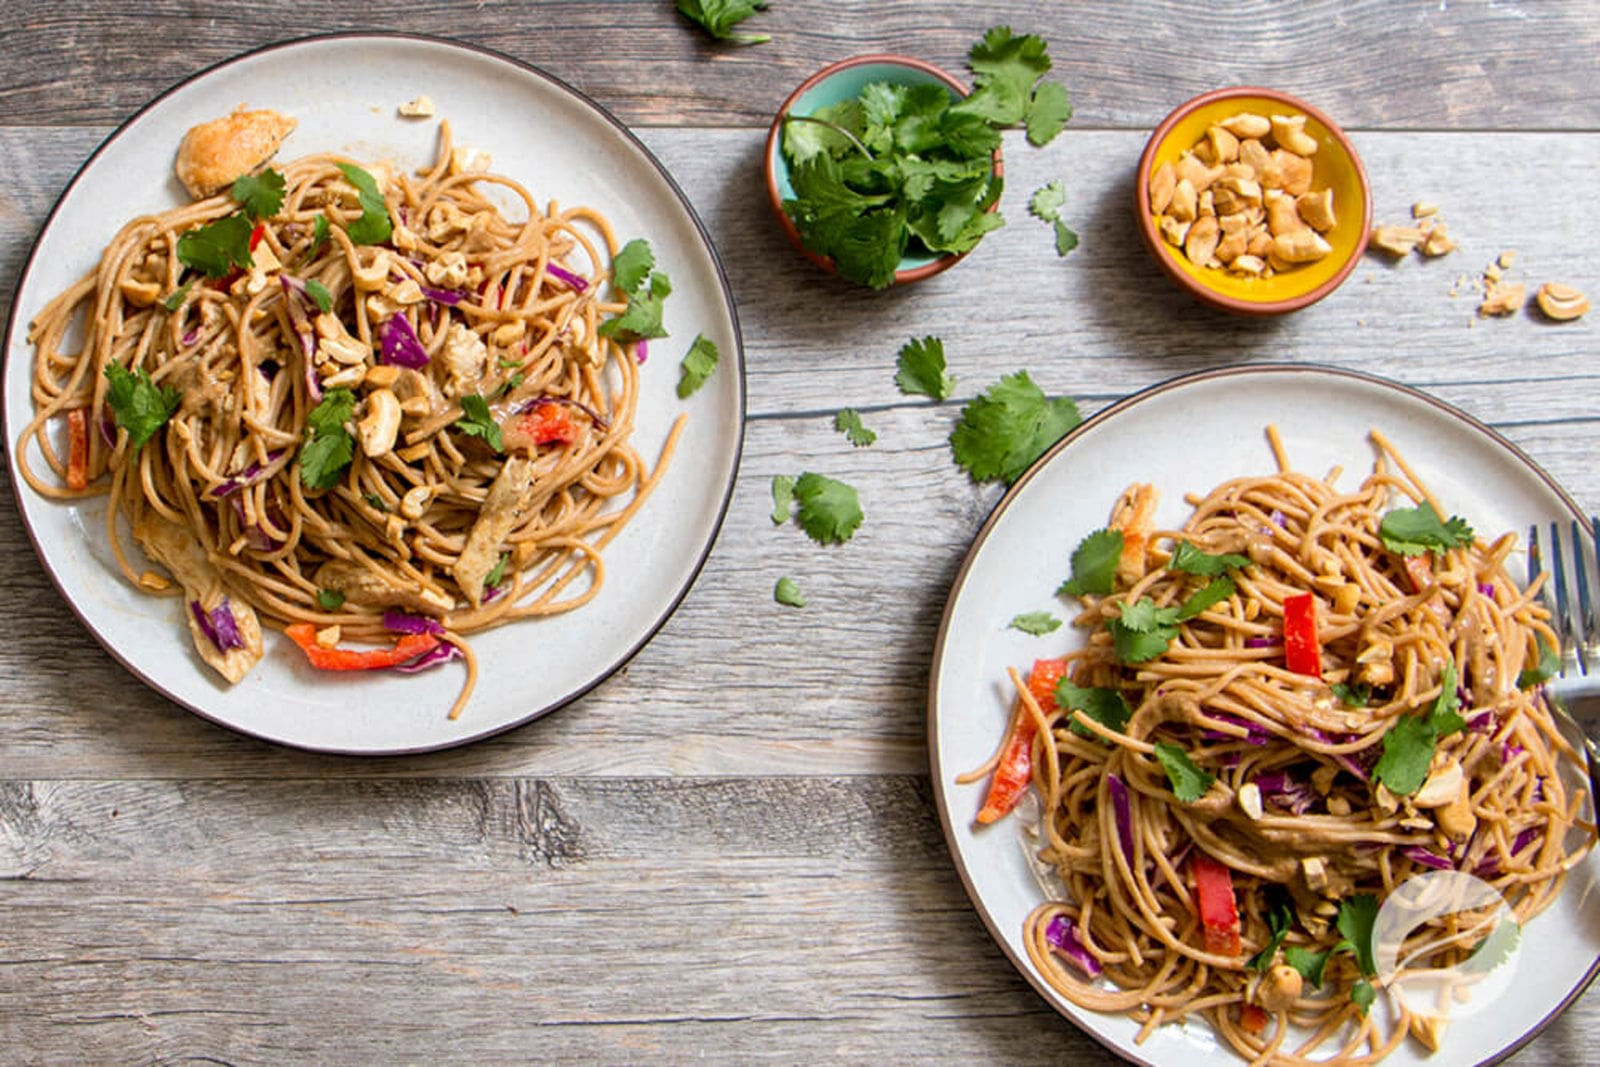 Image of Thai Chicken Noodle Salad